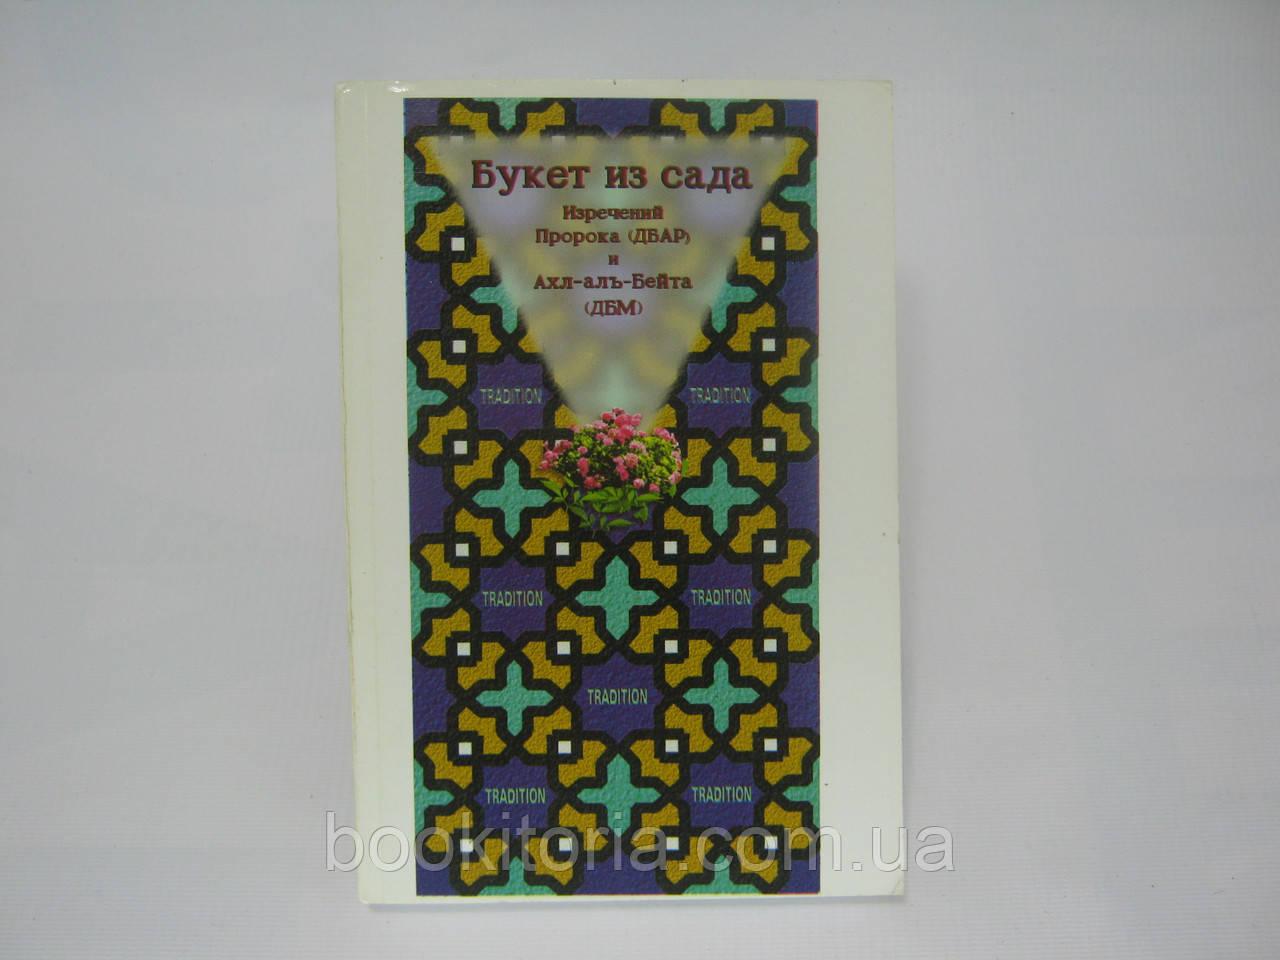 Букет из сада изречений изречений Пророка Мухаммада (ДБАР) и Ахл аль-бейта (ДМБ) (б/у).